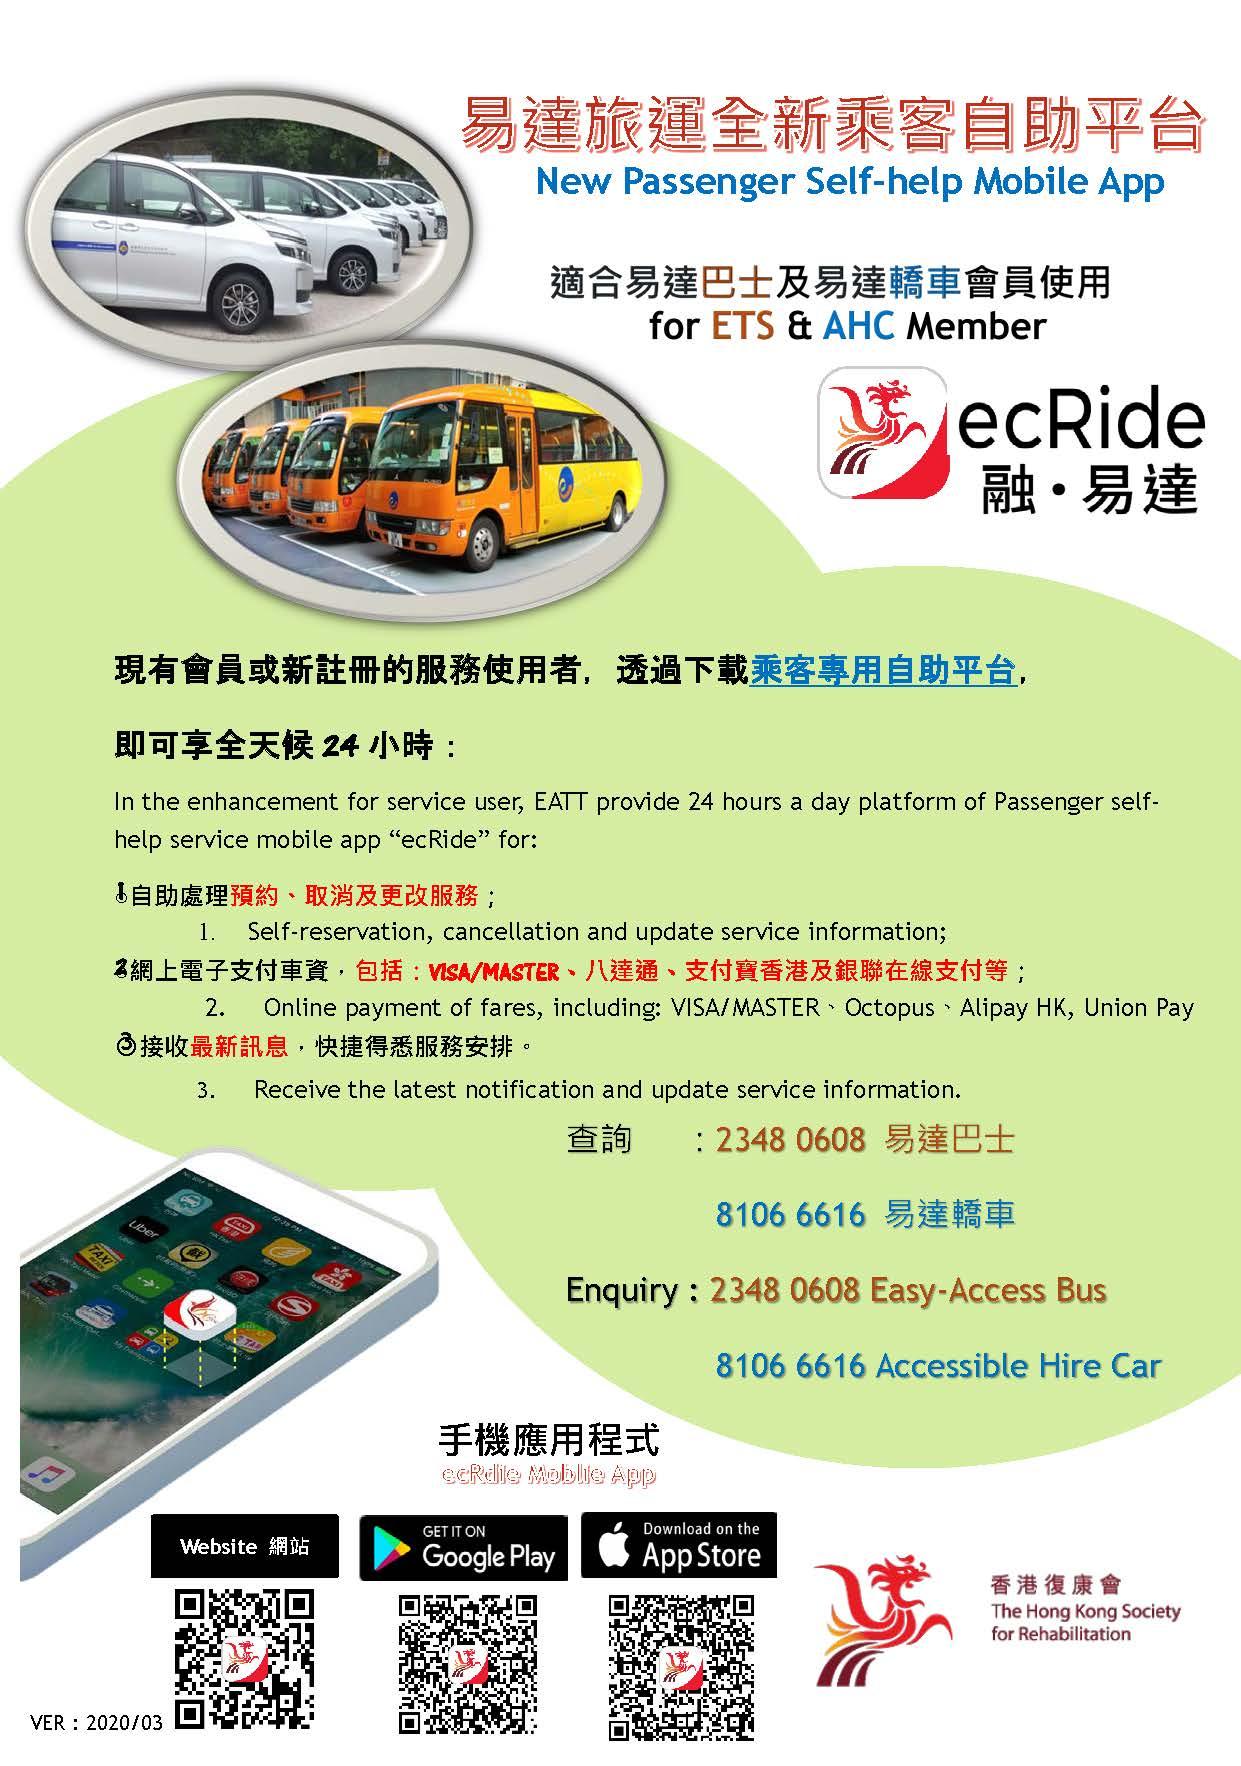 ecRide Promotion Poster